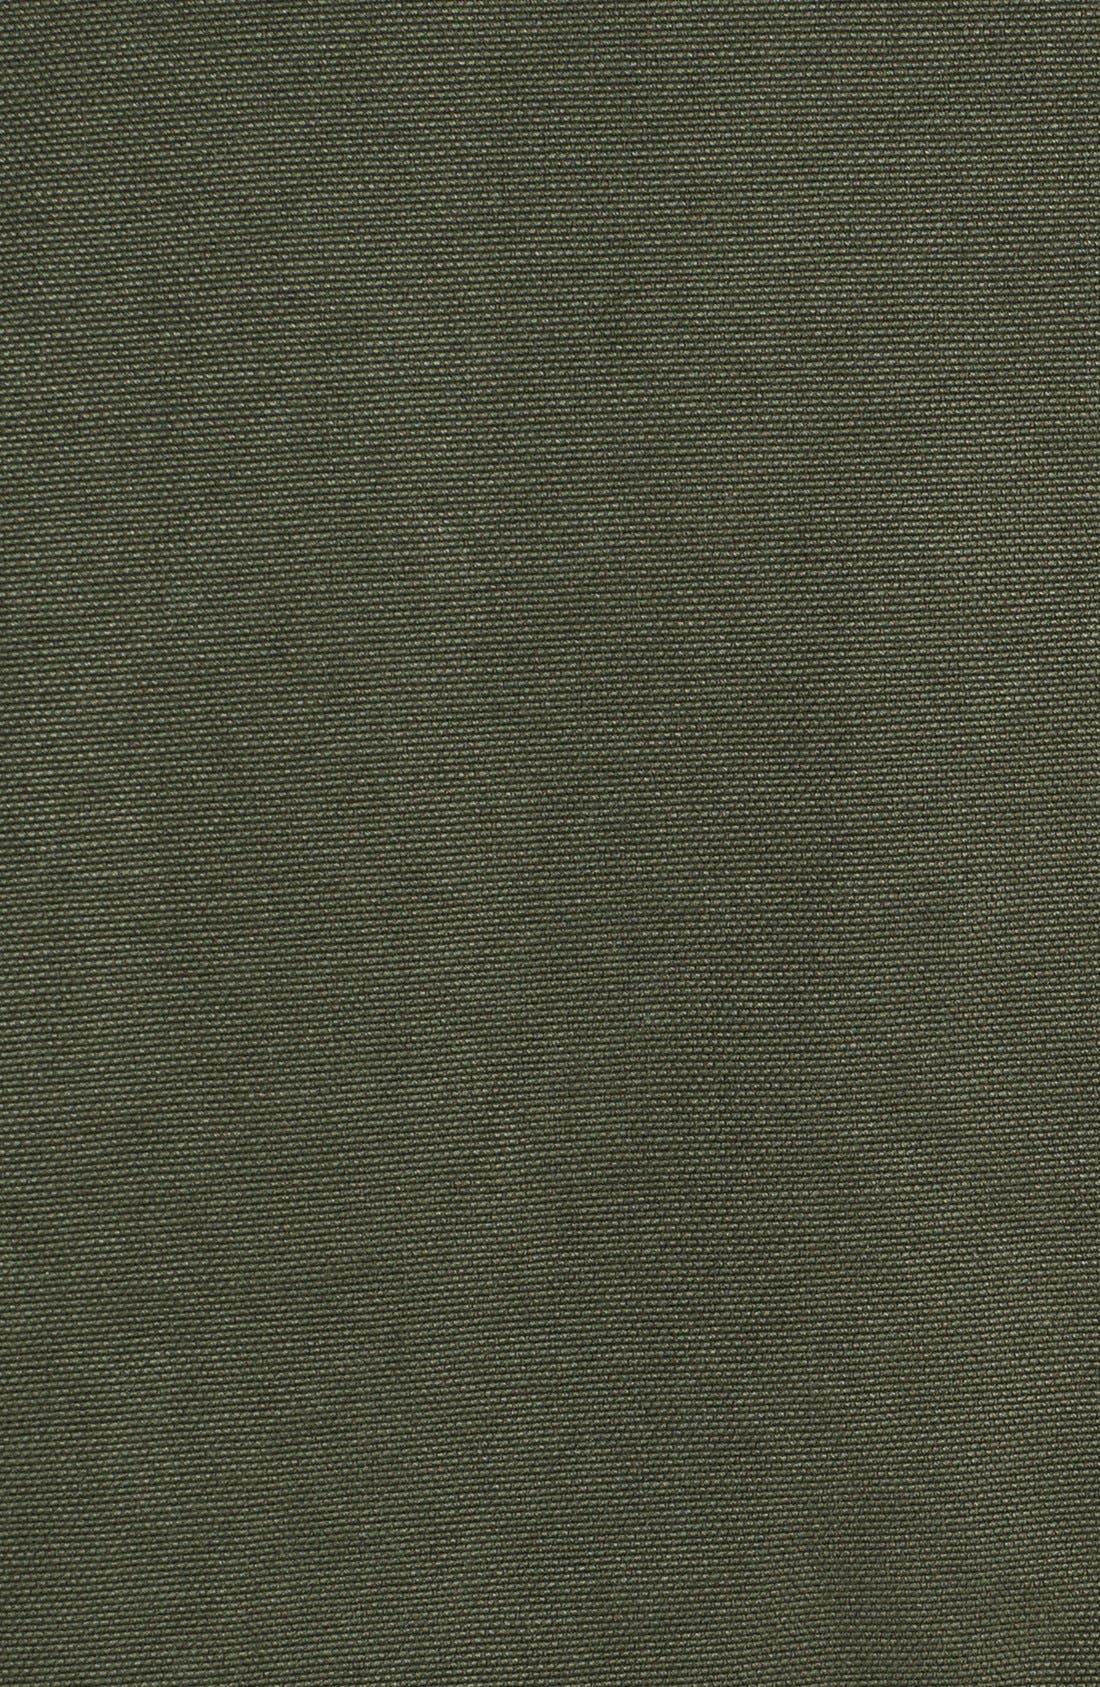 Alternate Image 3  - Scotch & Soda Military Jacket with Knit Sleeves